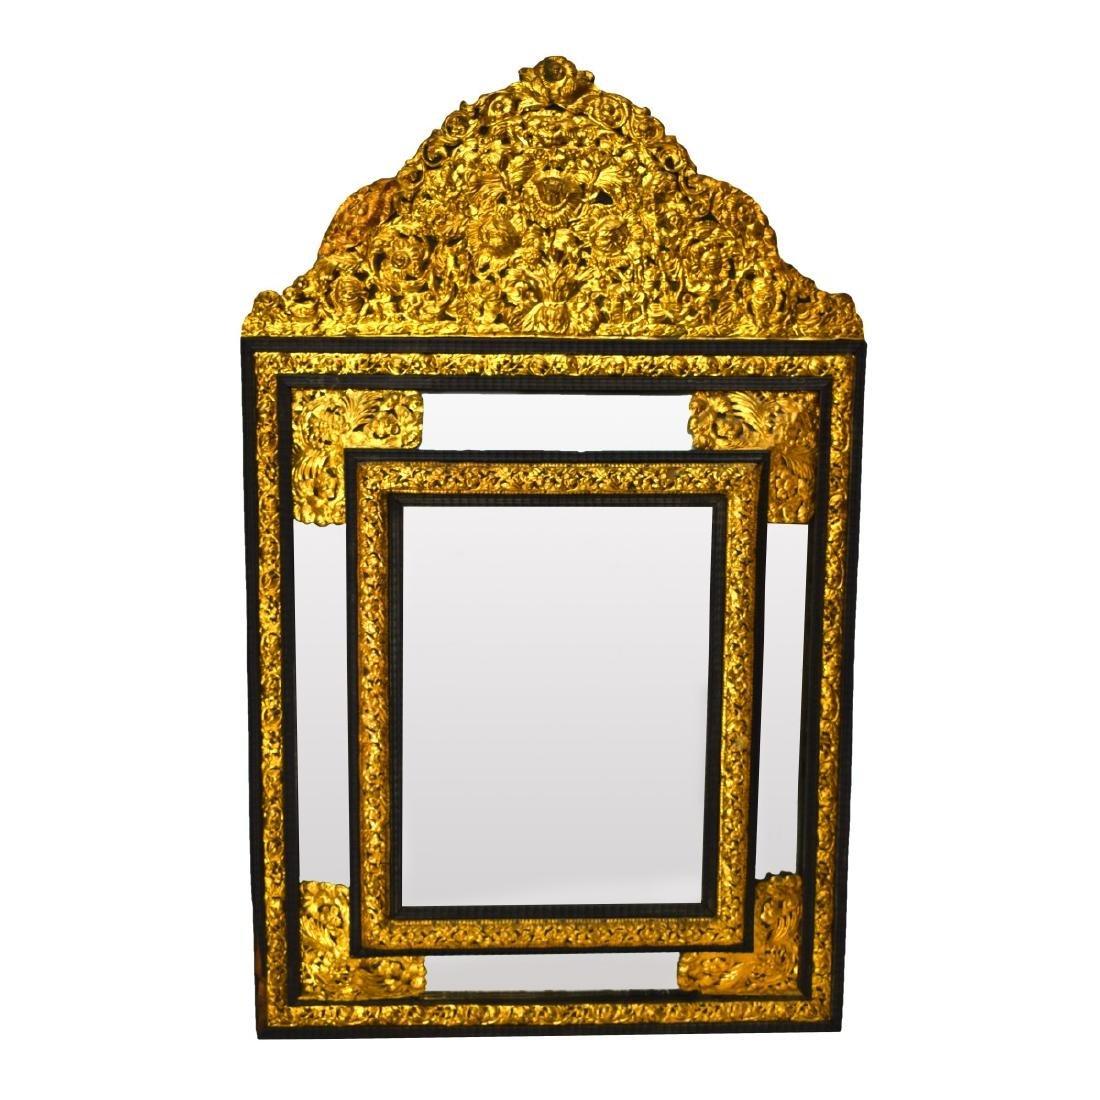 Large French Napoleon II Style Cushion Mirror